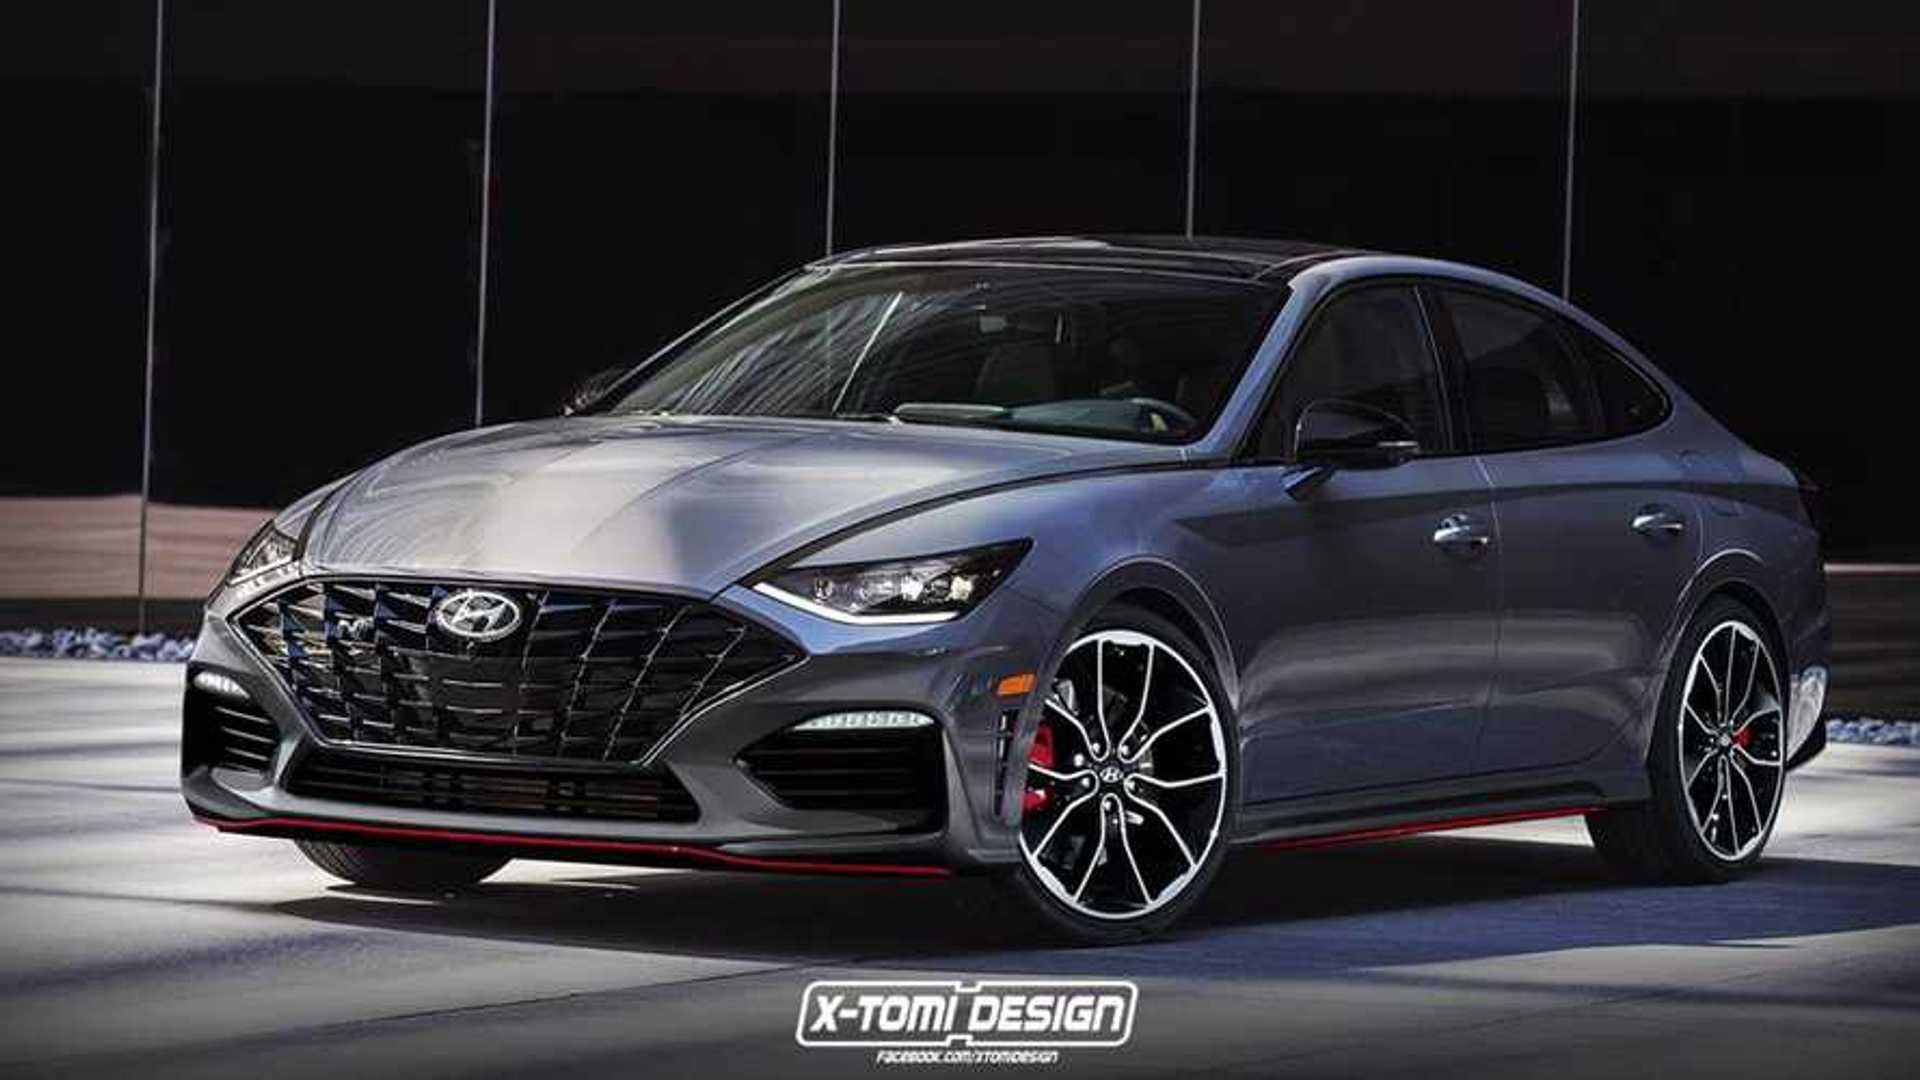 Hyundai Sonata N Line Coming Soon With 2 5 Liter Turbo Engine